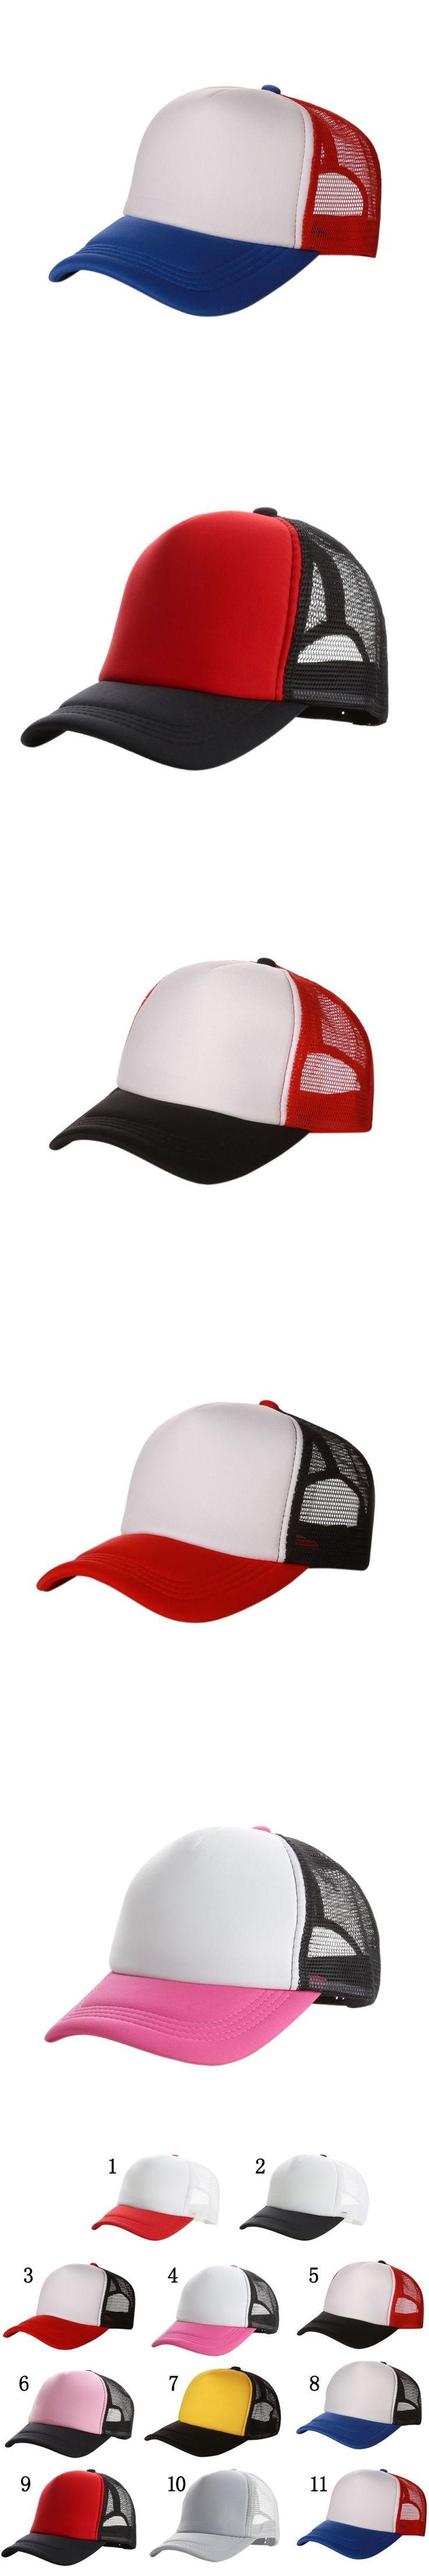 Fashion Good-looking New Plain Baseball Cap Solid Trucker Mesh Blank Curved Adjustable Baseball Hat baseball cap snapback